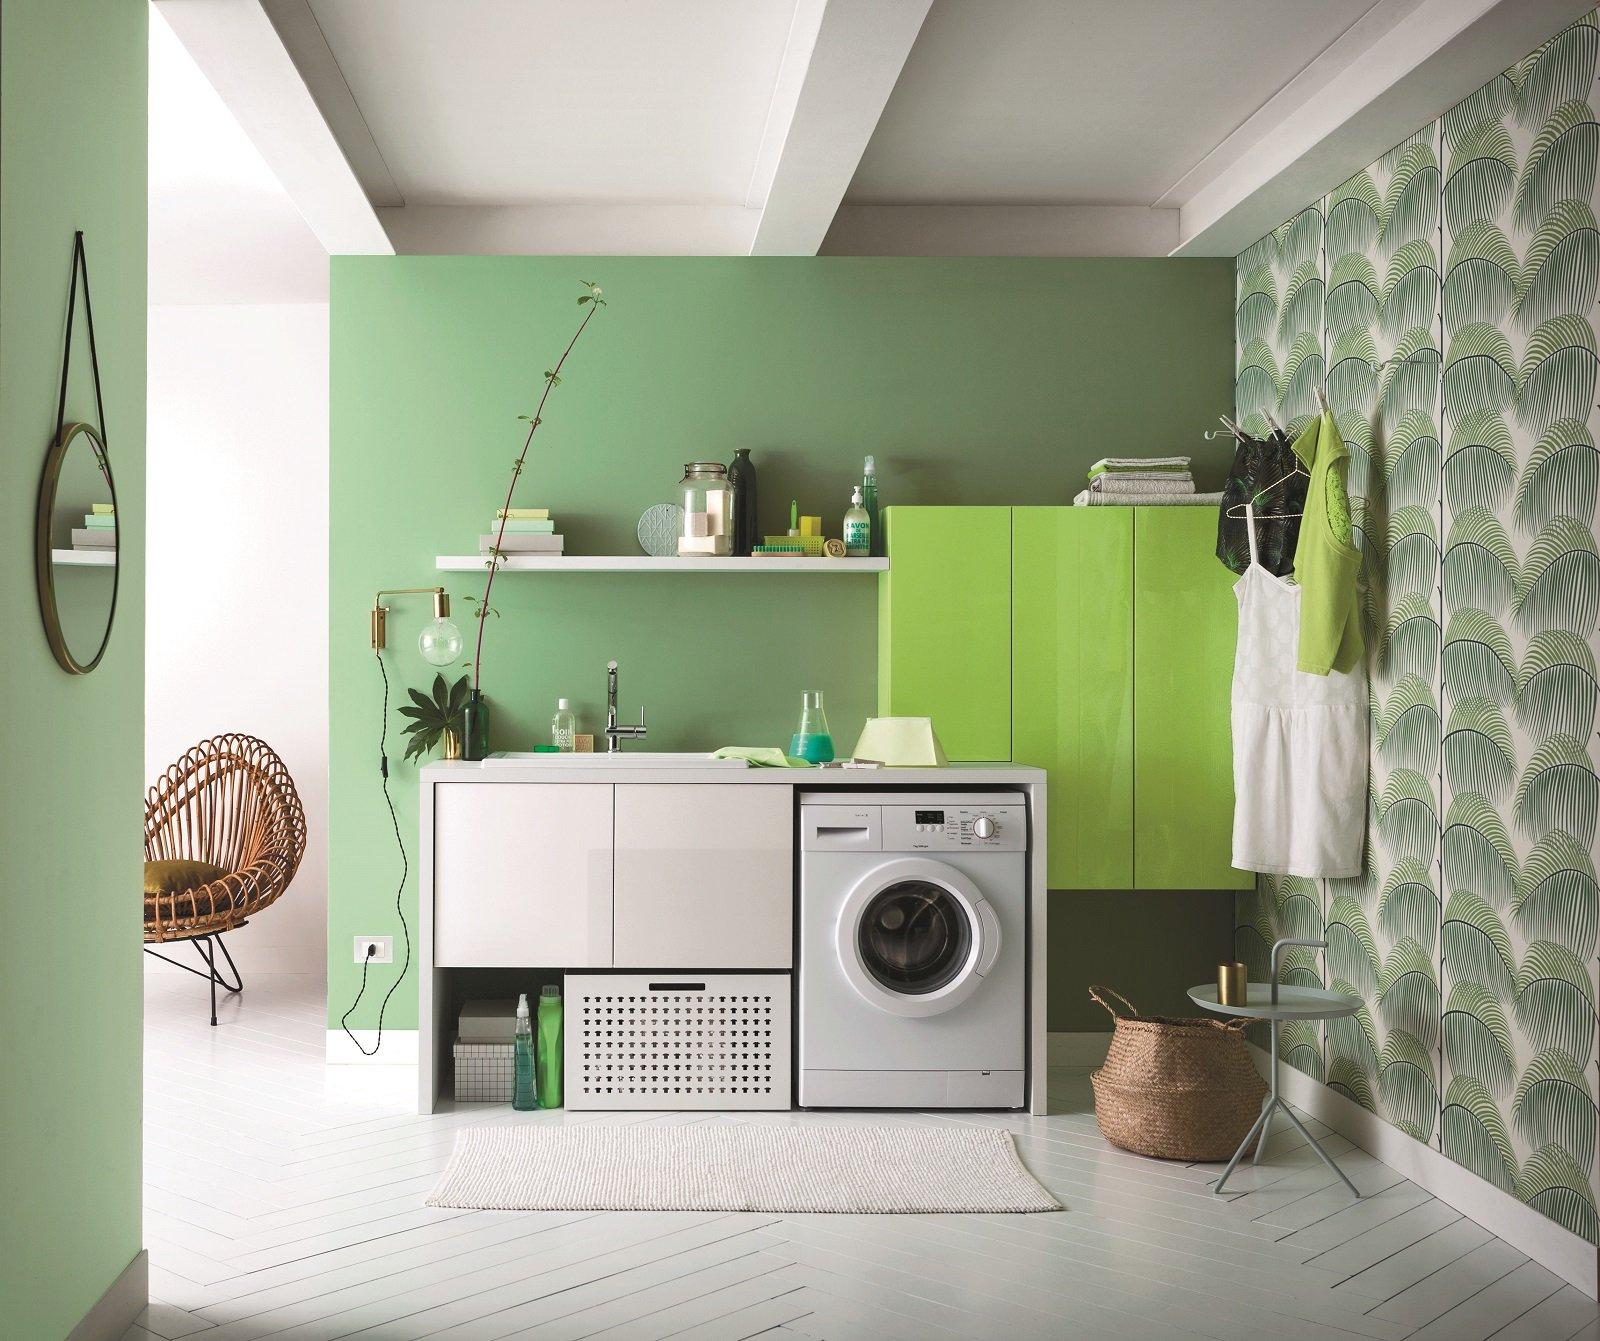 Lavanderia in bagno cose di casa - Accessori lavanderia casa ...